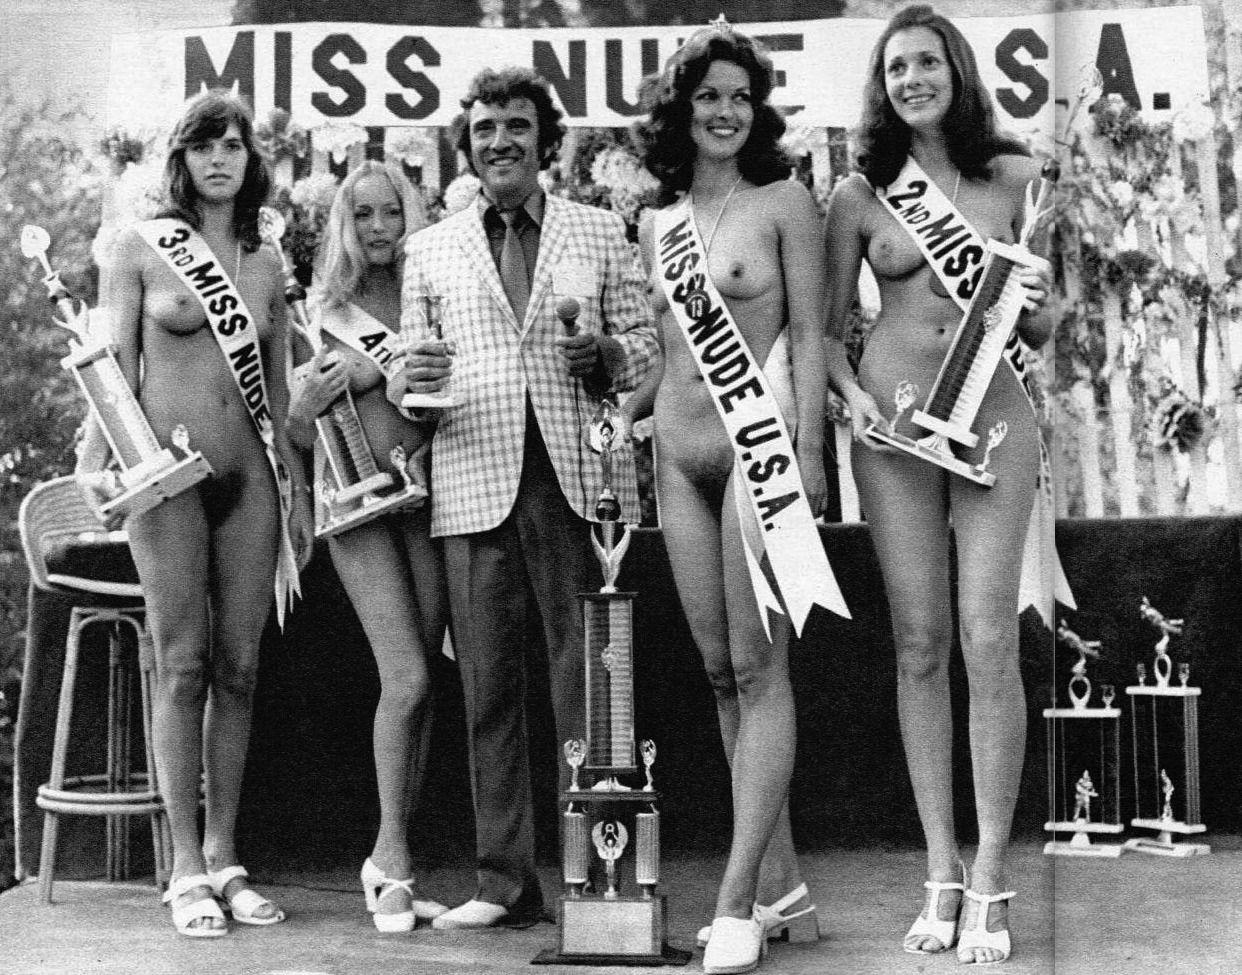 Miss beauty nudist contest